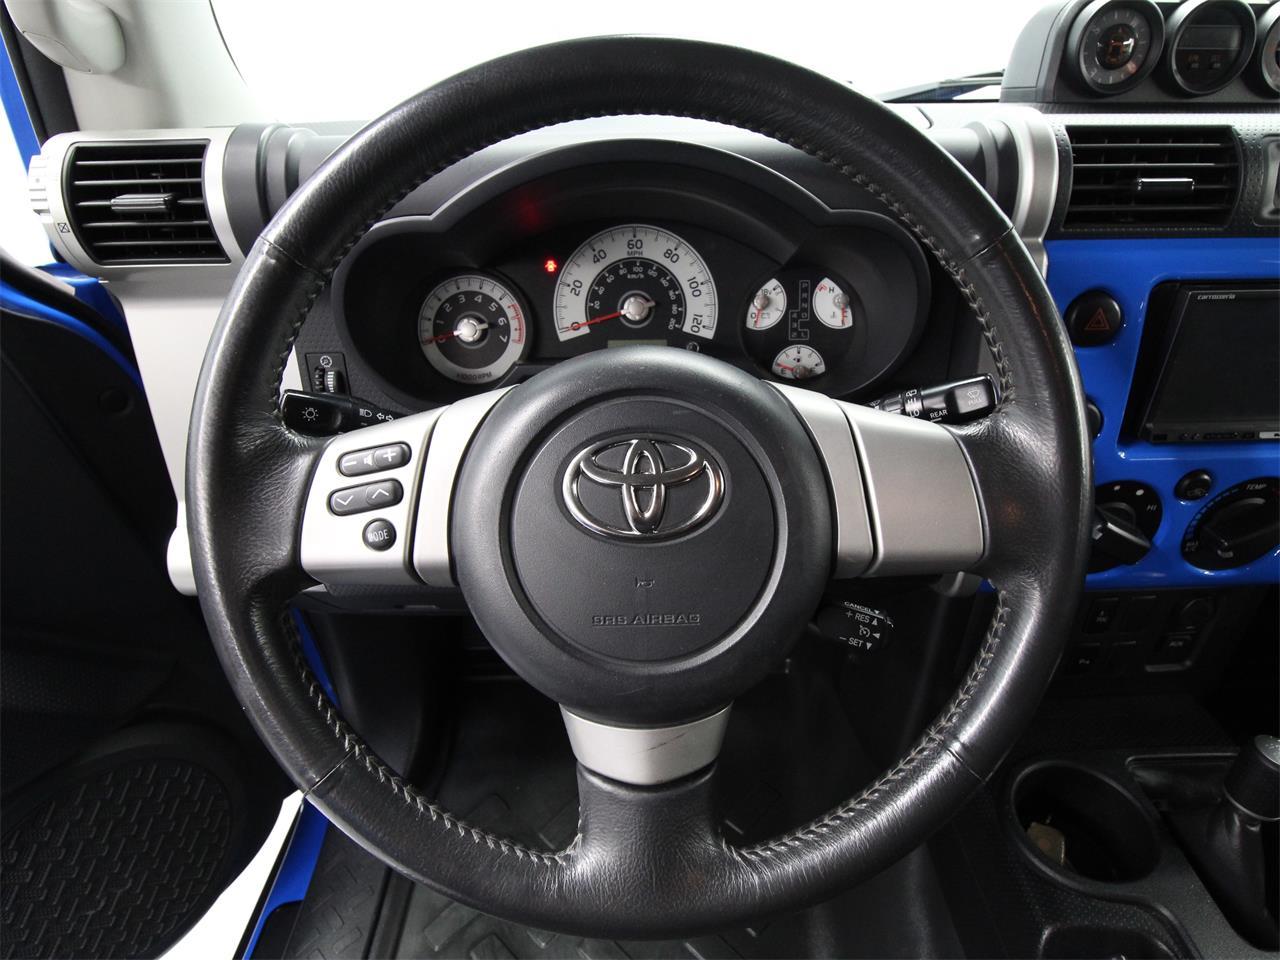 2007 Toyota FJ Cruiser (CC-1216195) for sale in Christiansburg, Virginia